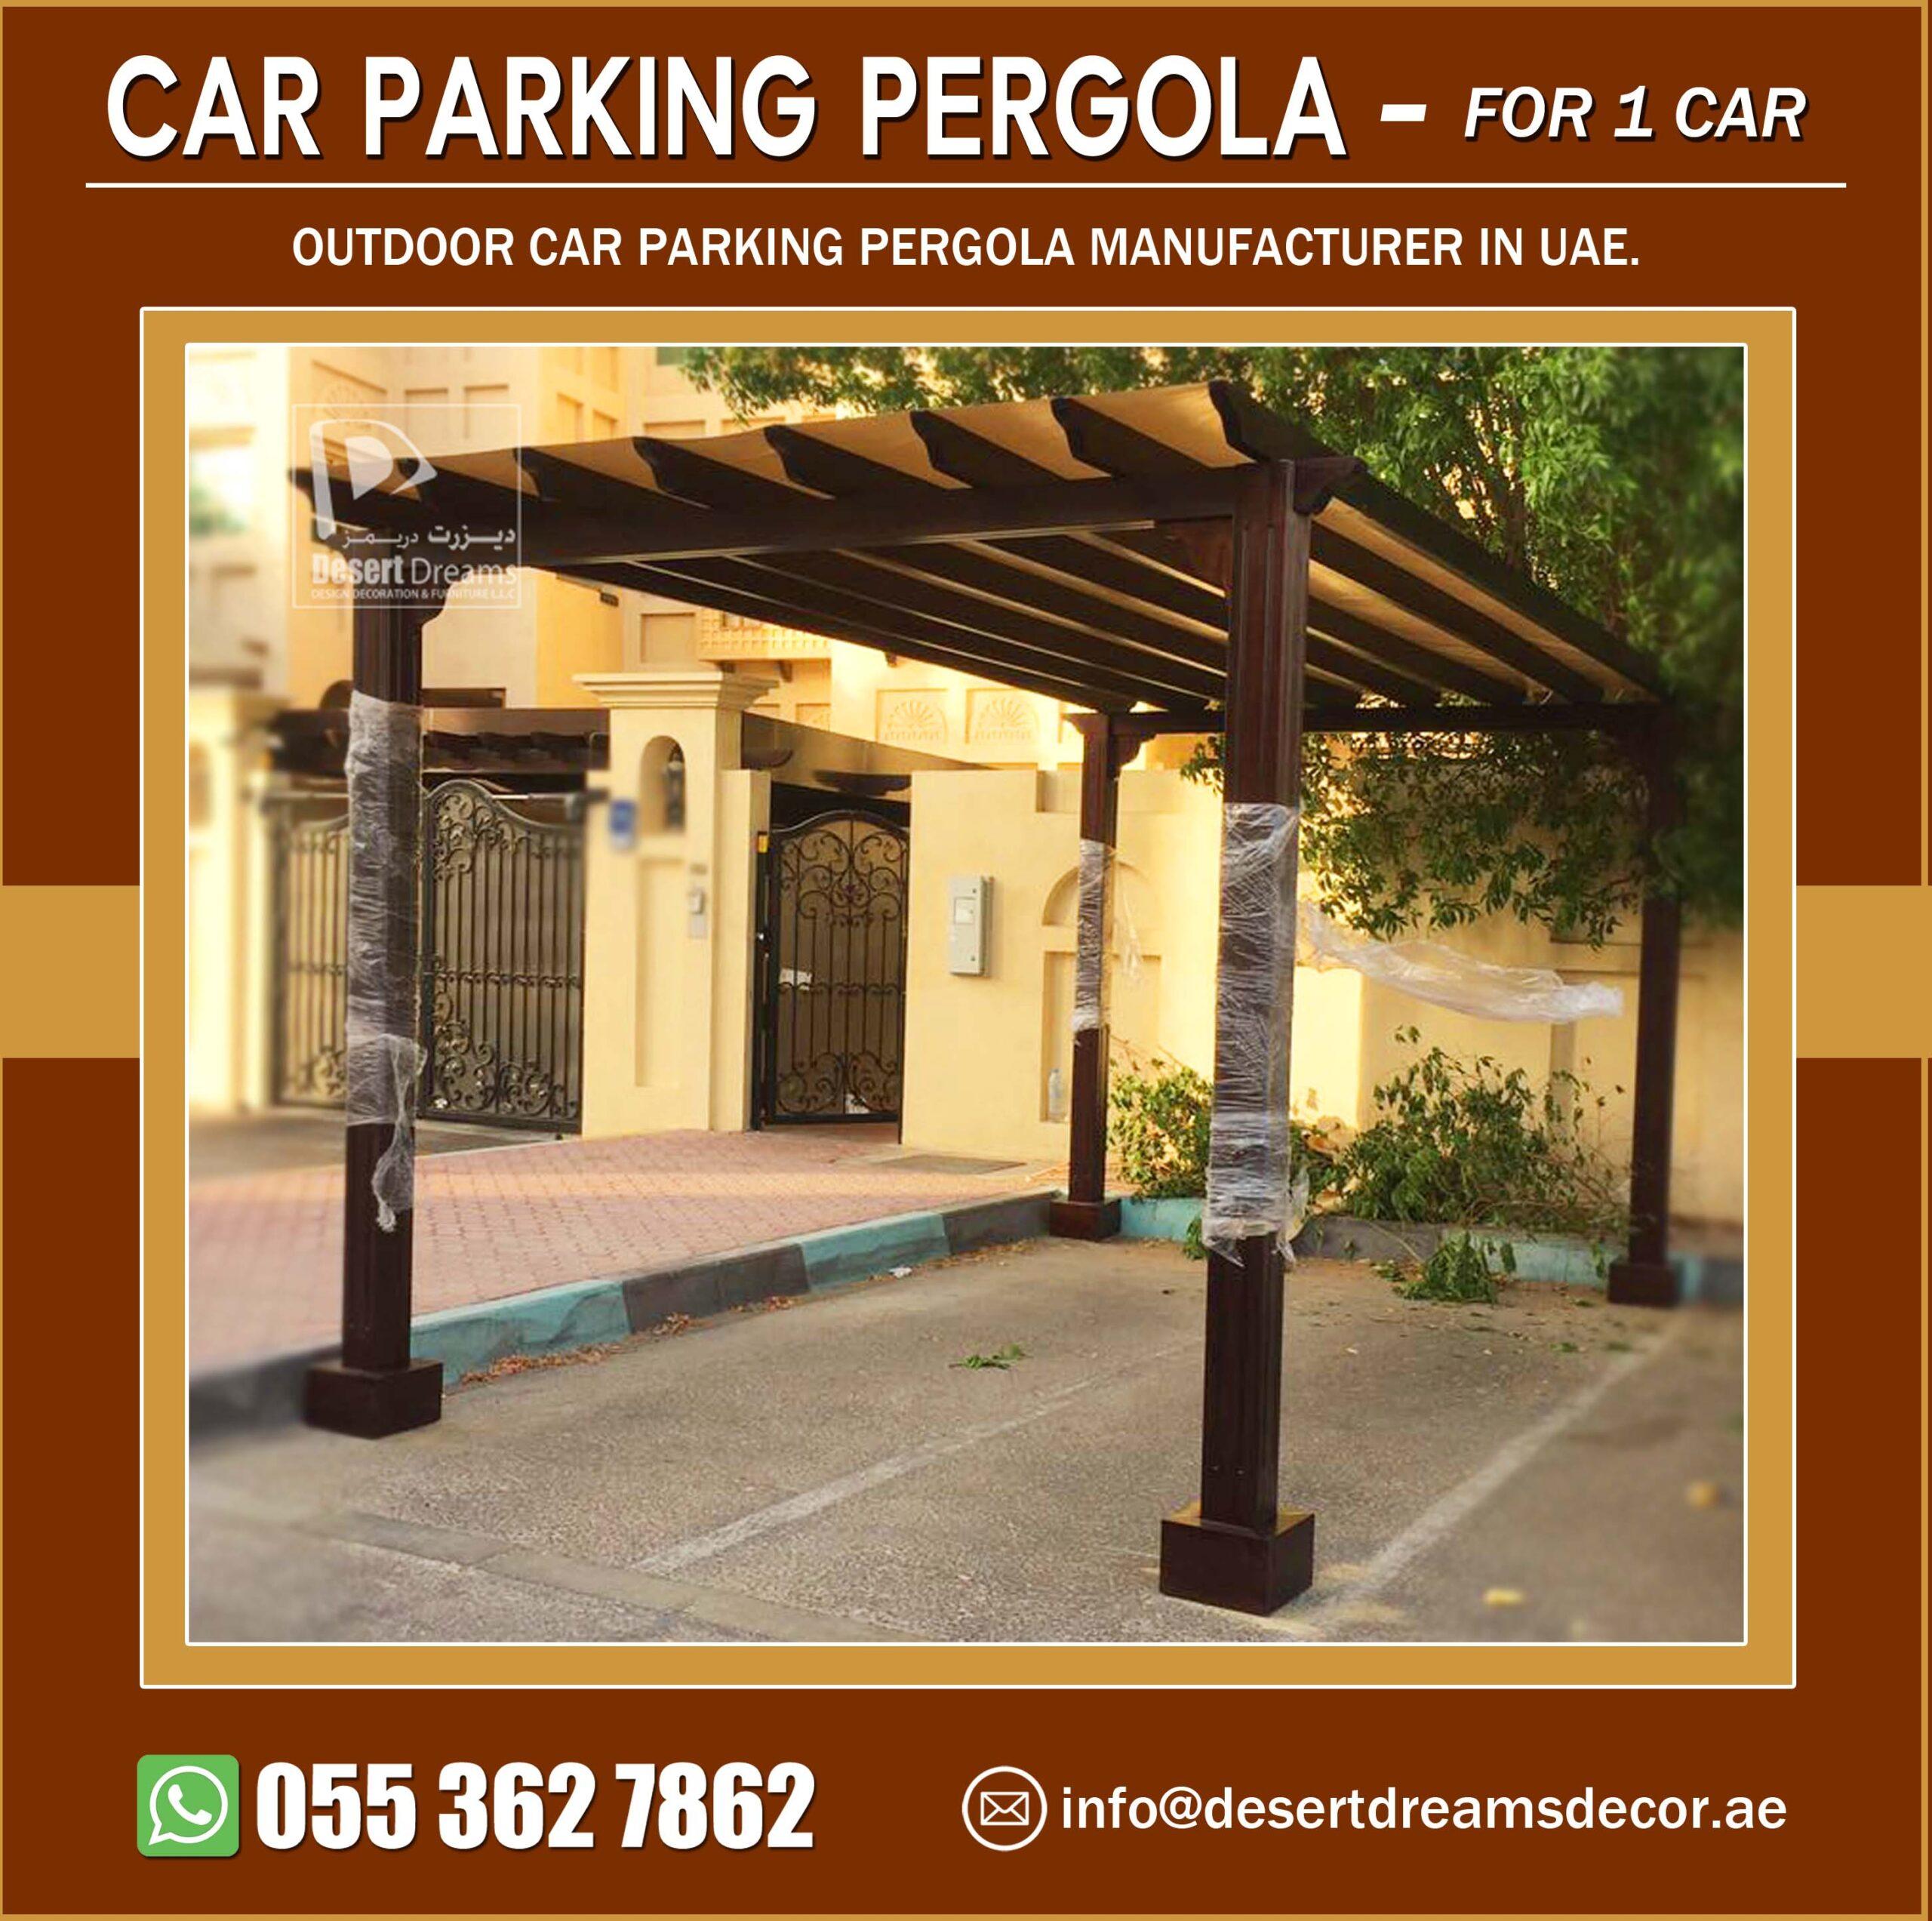 One Car Parking Pergola Manufacturer in UAE.jpg